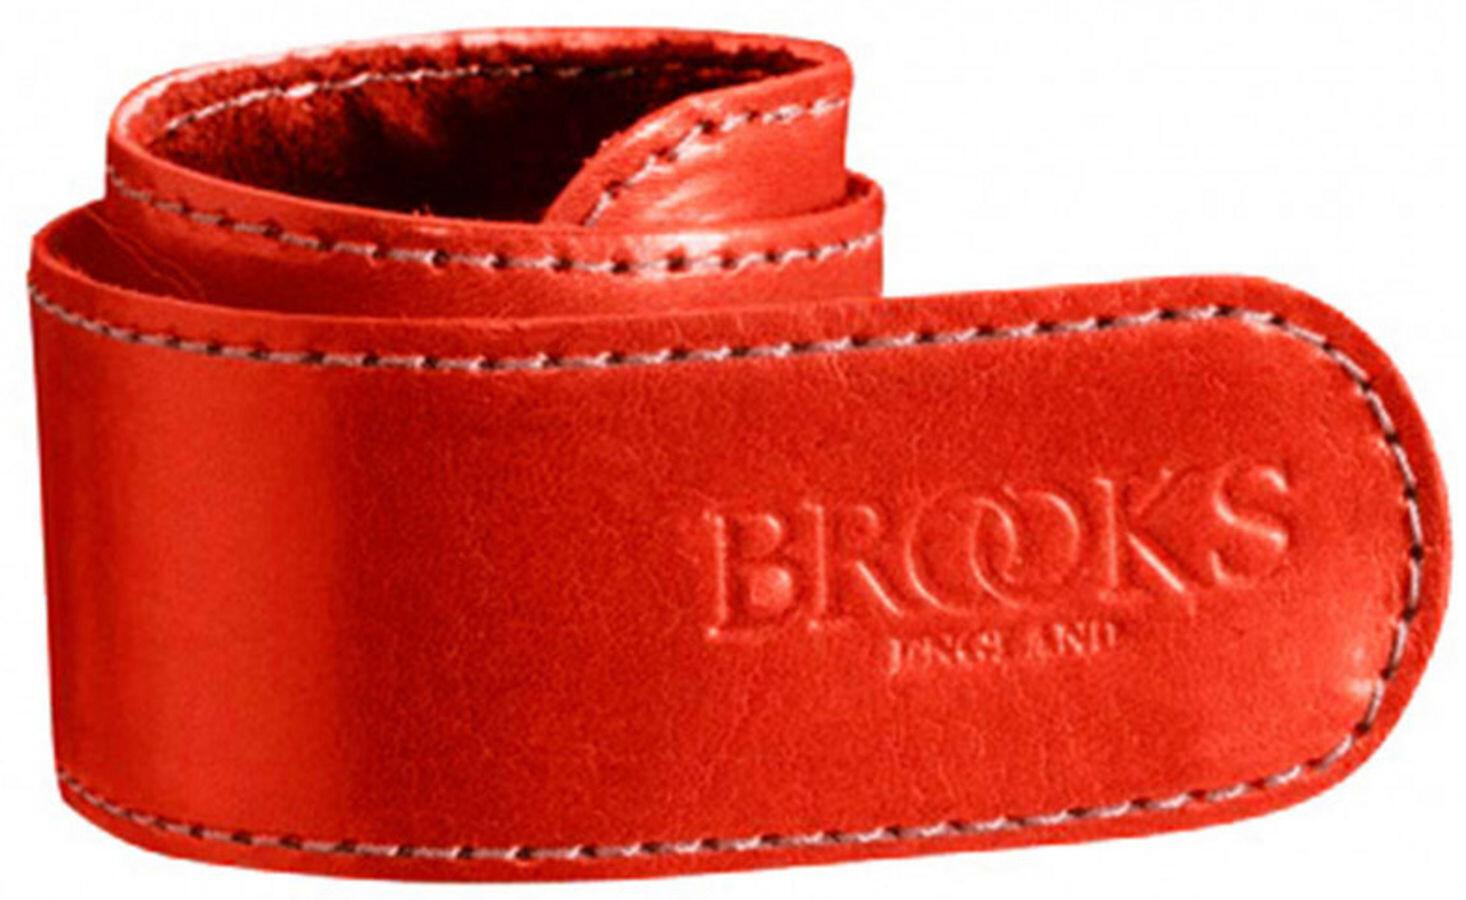 Brooks Trousers Strap, red | Andet beklædning